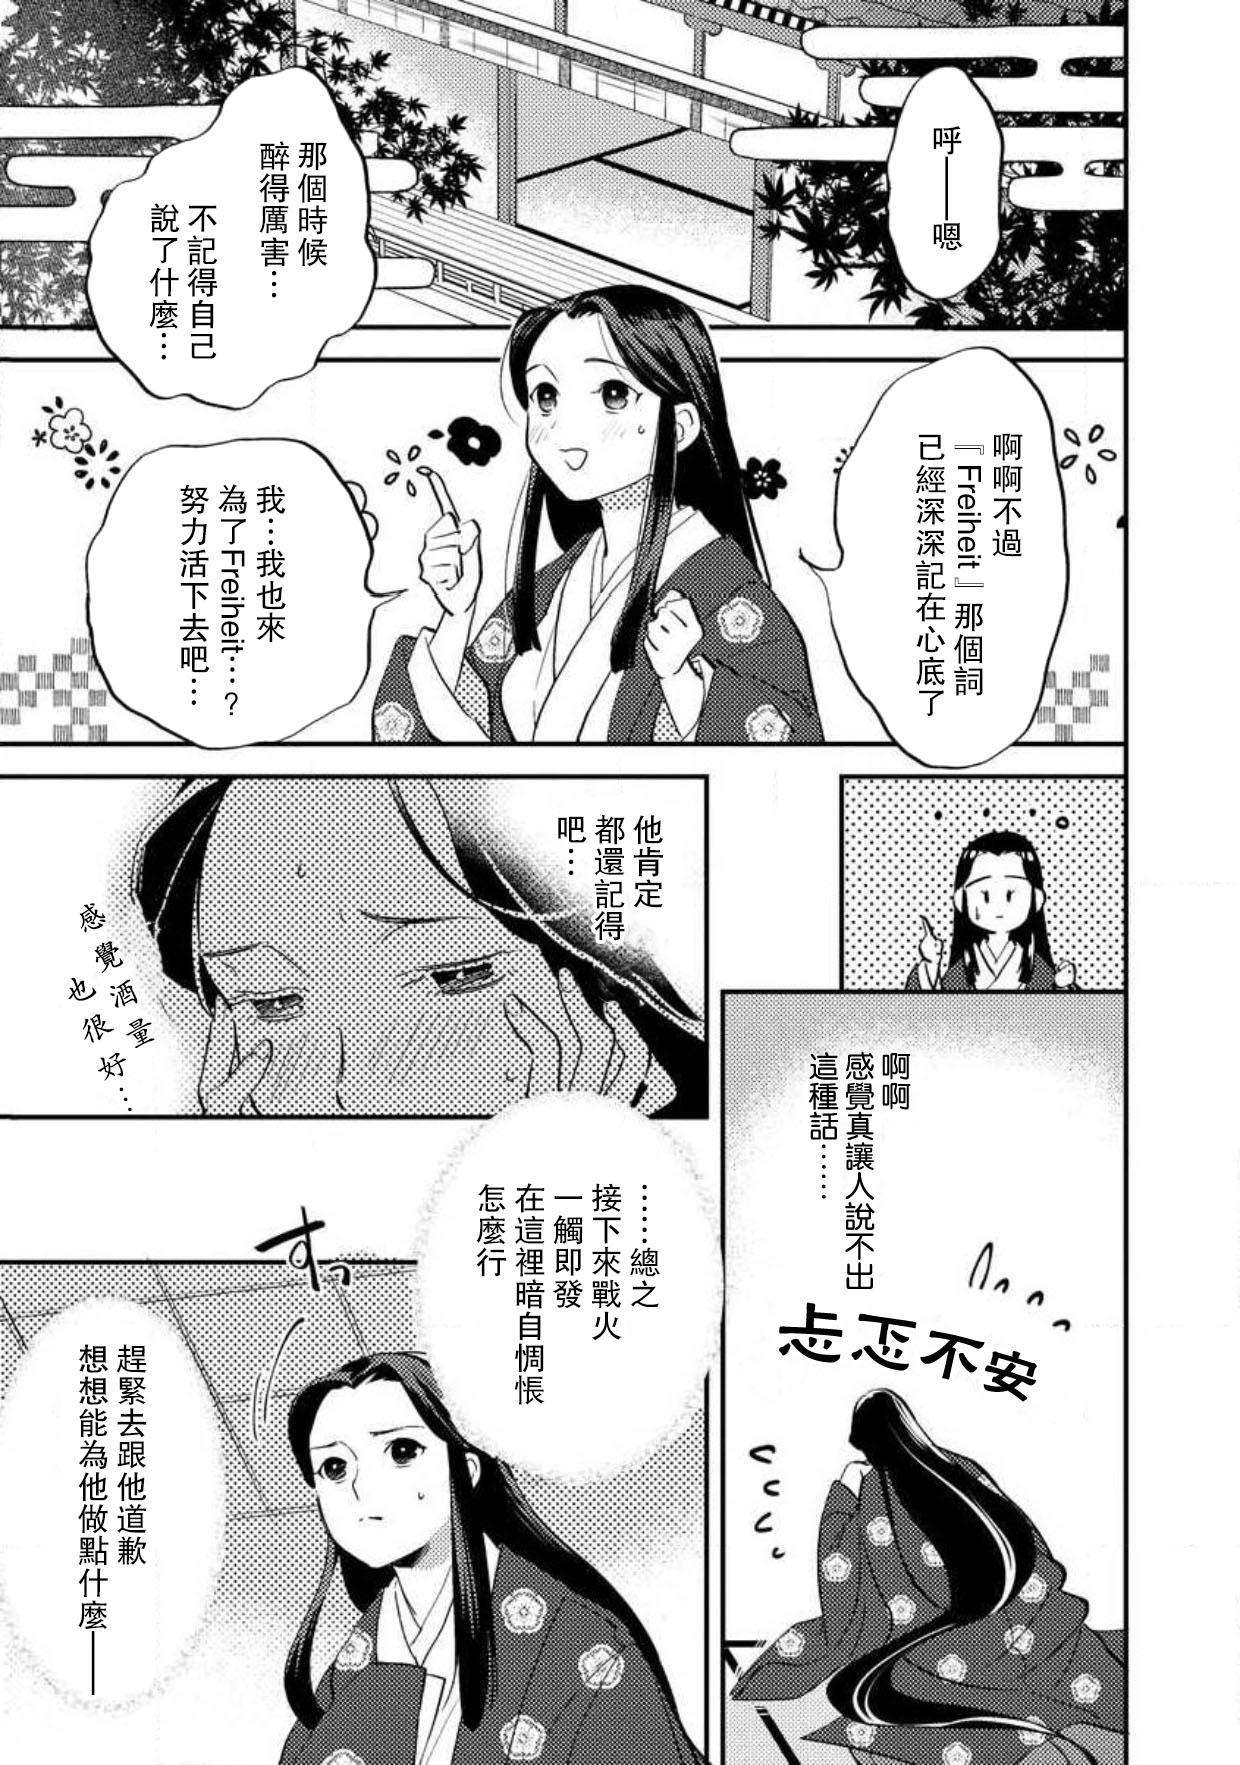 Oeyama suimutan utsukushiki oni no toraware hime | 大江山醉夢逸話 美麗的鬼與被囚禁的公主 Ch. 1-8 168